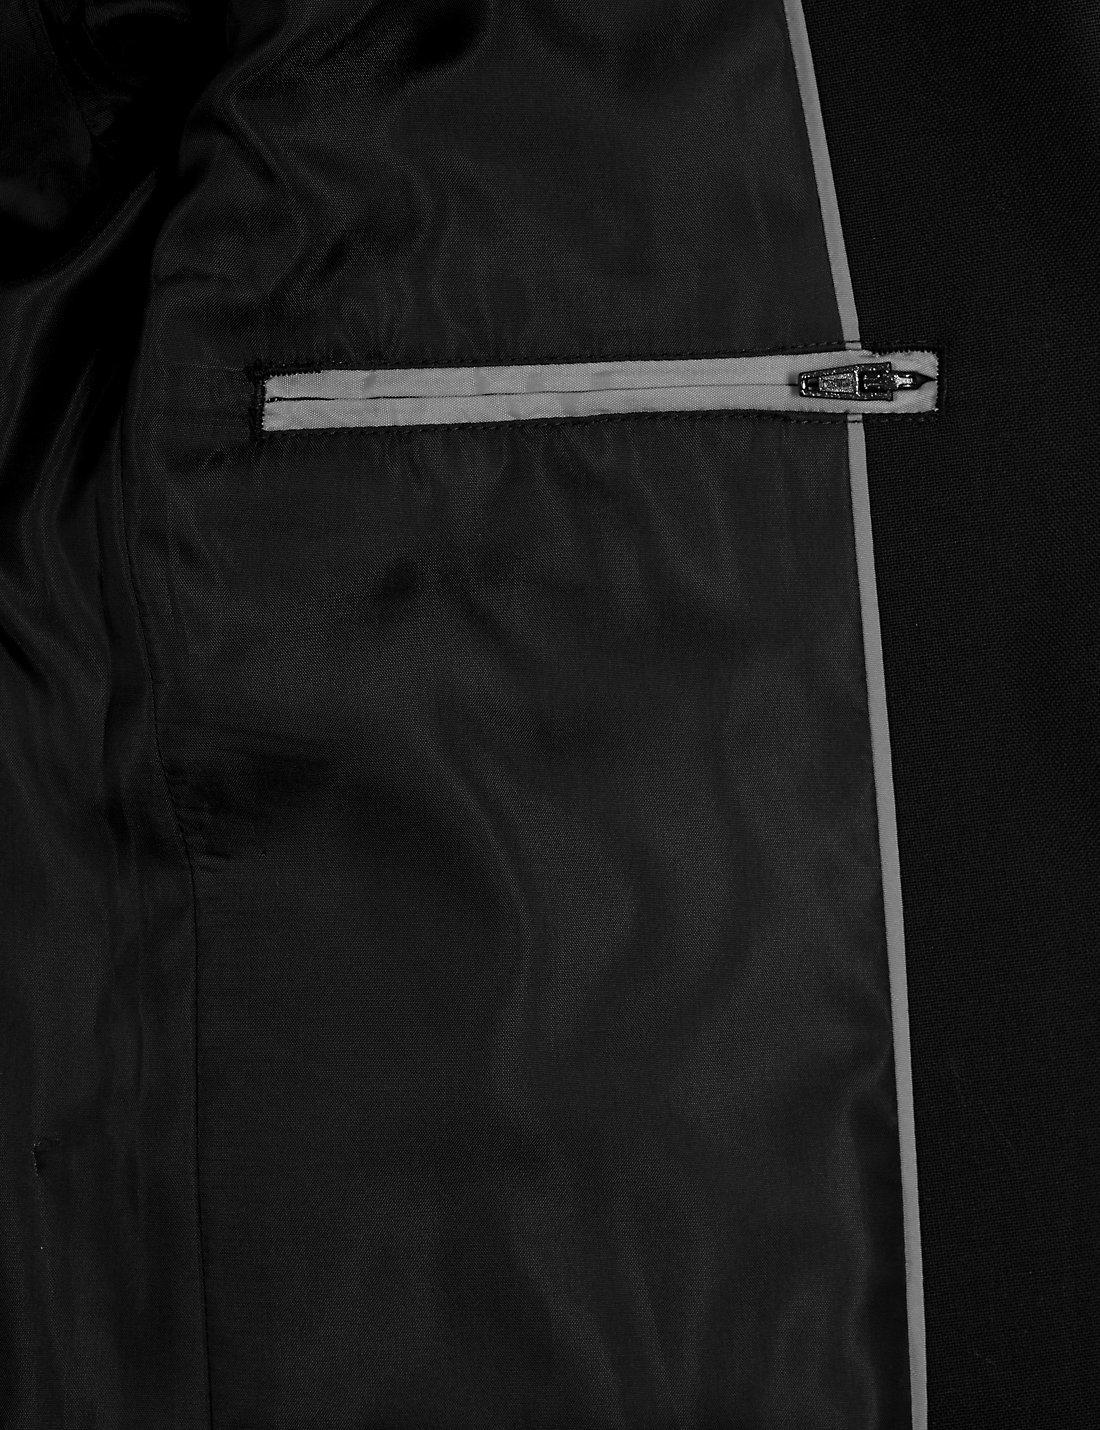 Customized Primary School Uniform Design for School Suits jacket